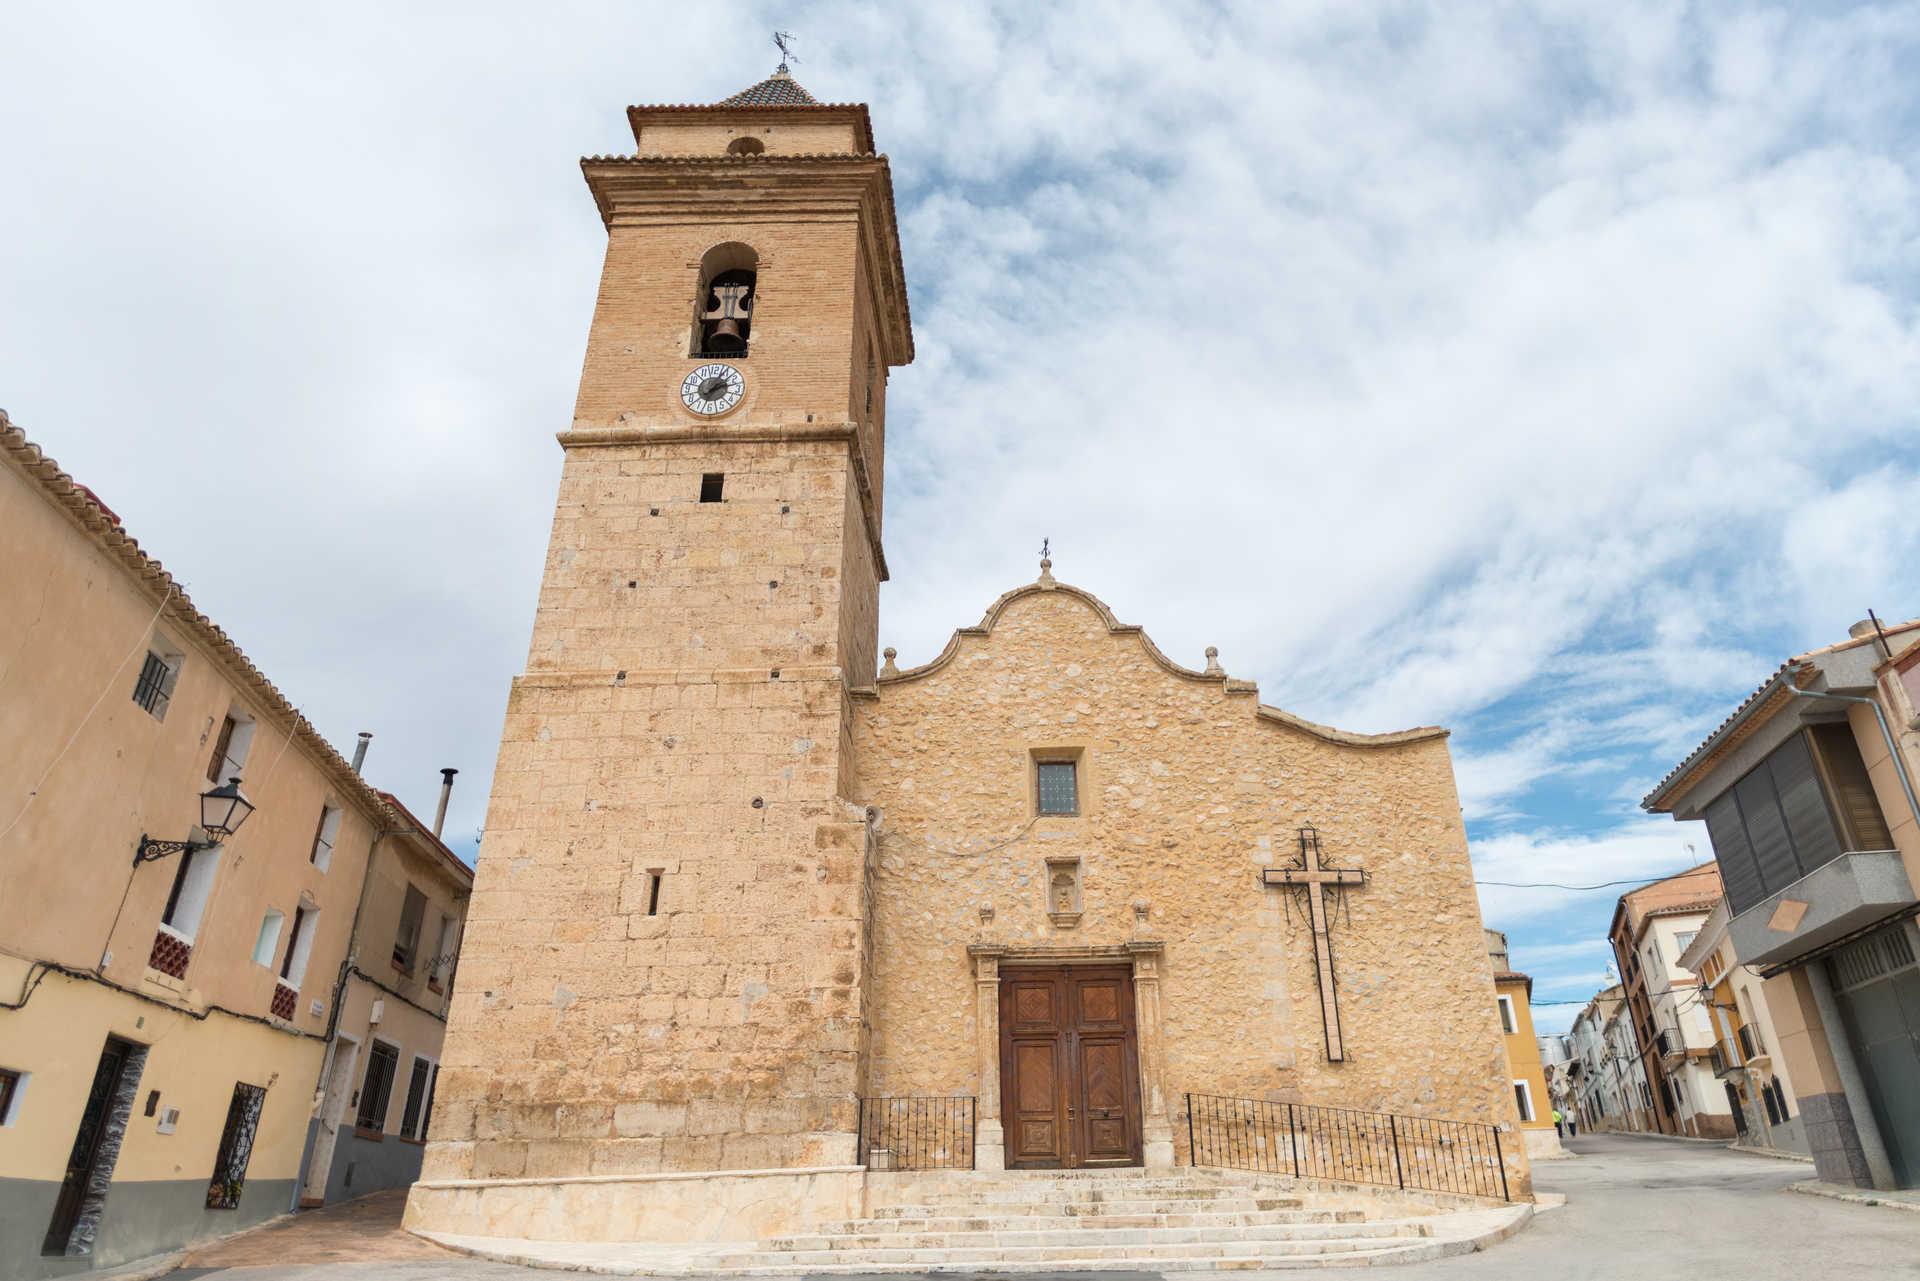 https://multimedia.comunitatvalenciana.com/09E9151ED6E14C8AB74990E8E6AD3F26/img/123E2CE5EA184DEAA765AA9E7910E8F0/Iglesia_de_la_Virgen_de_Loreto_Venta_Del_Moro__539.jpg?responsive